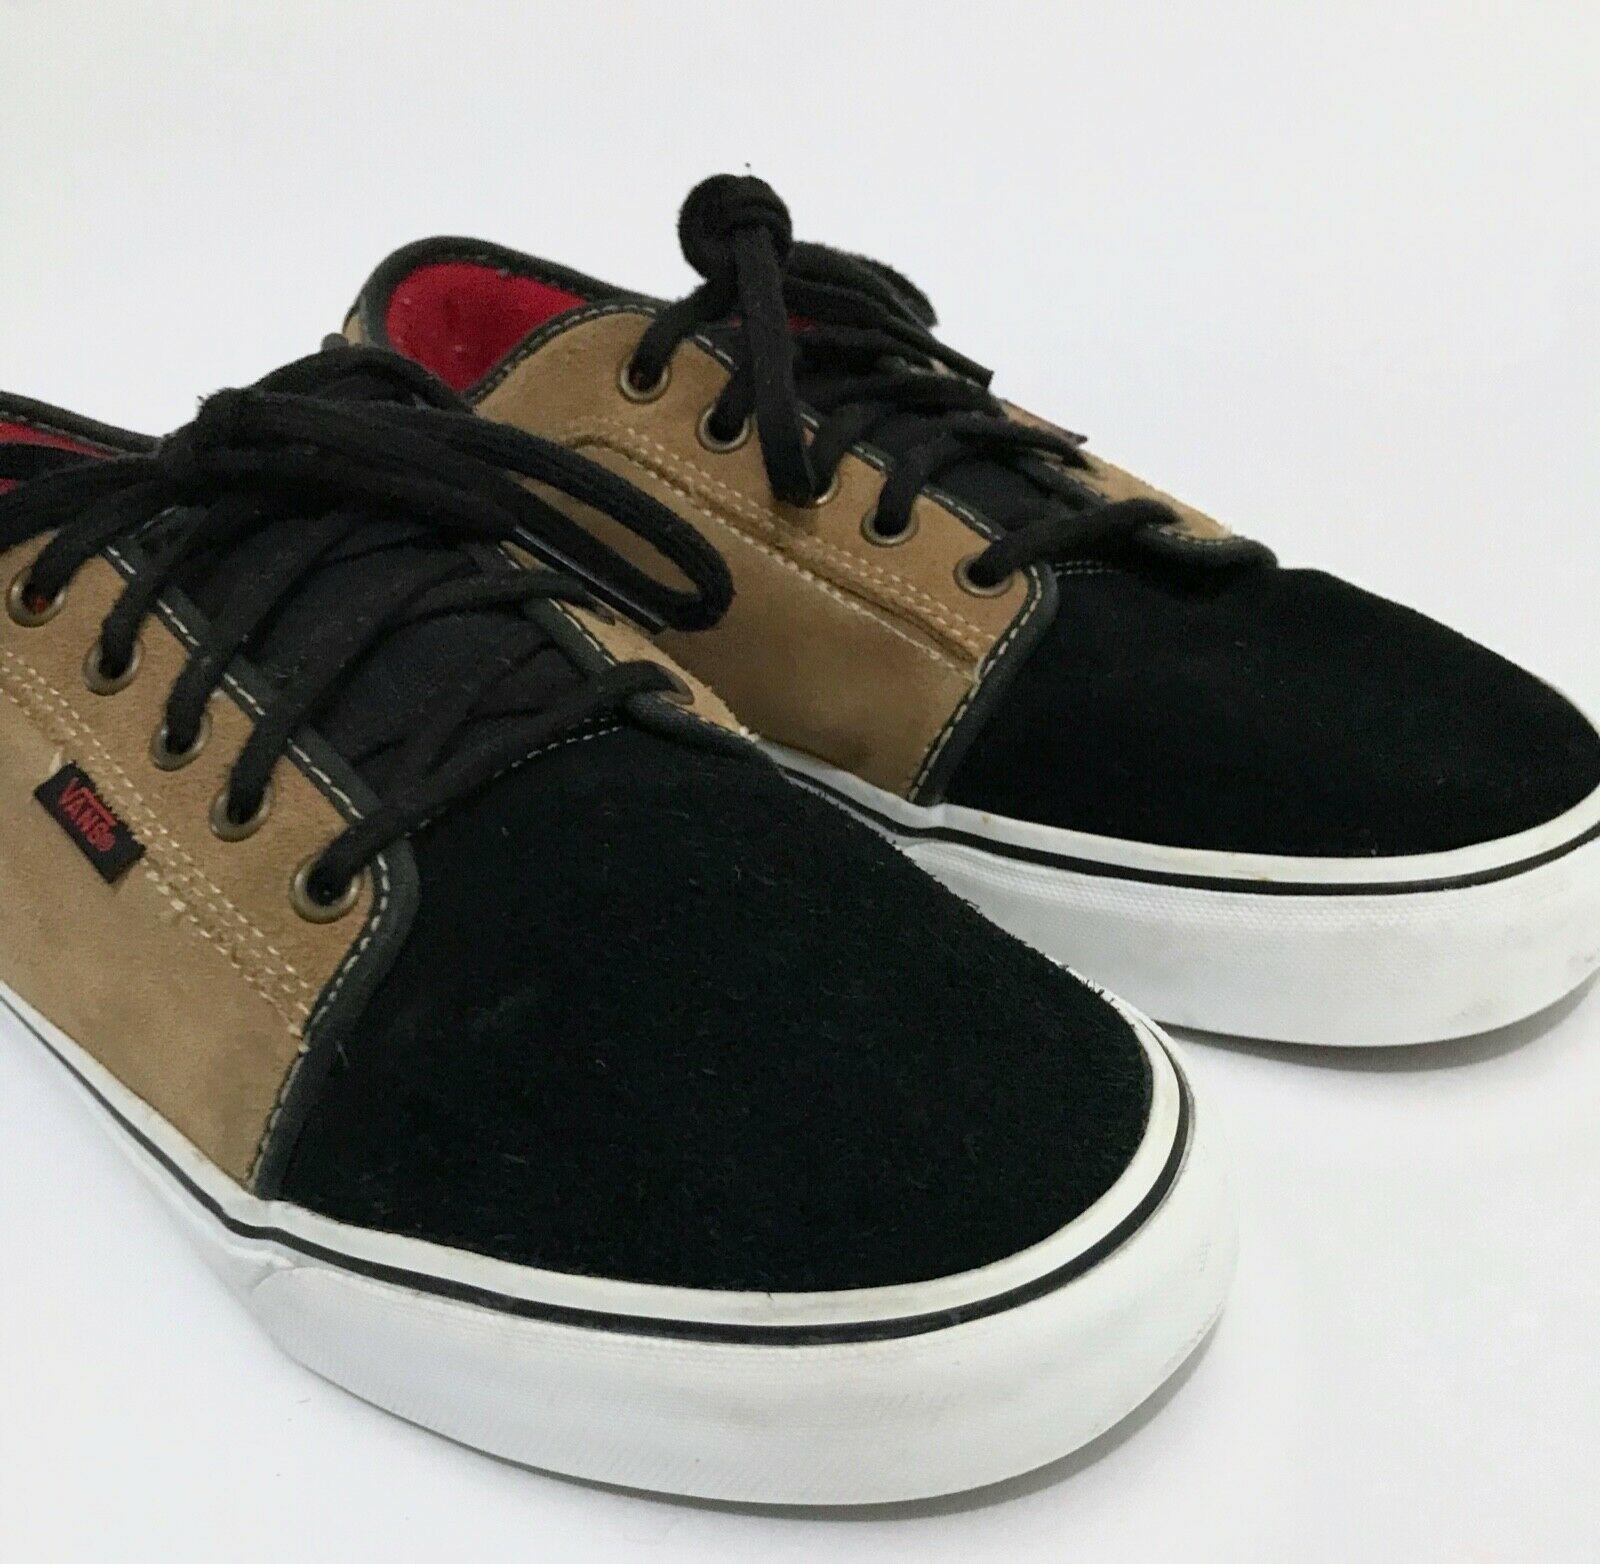 Vans Shoes Mens Size 10 Tan Brown Black Lo - Rare Colorway!